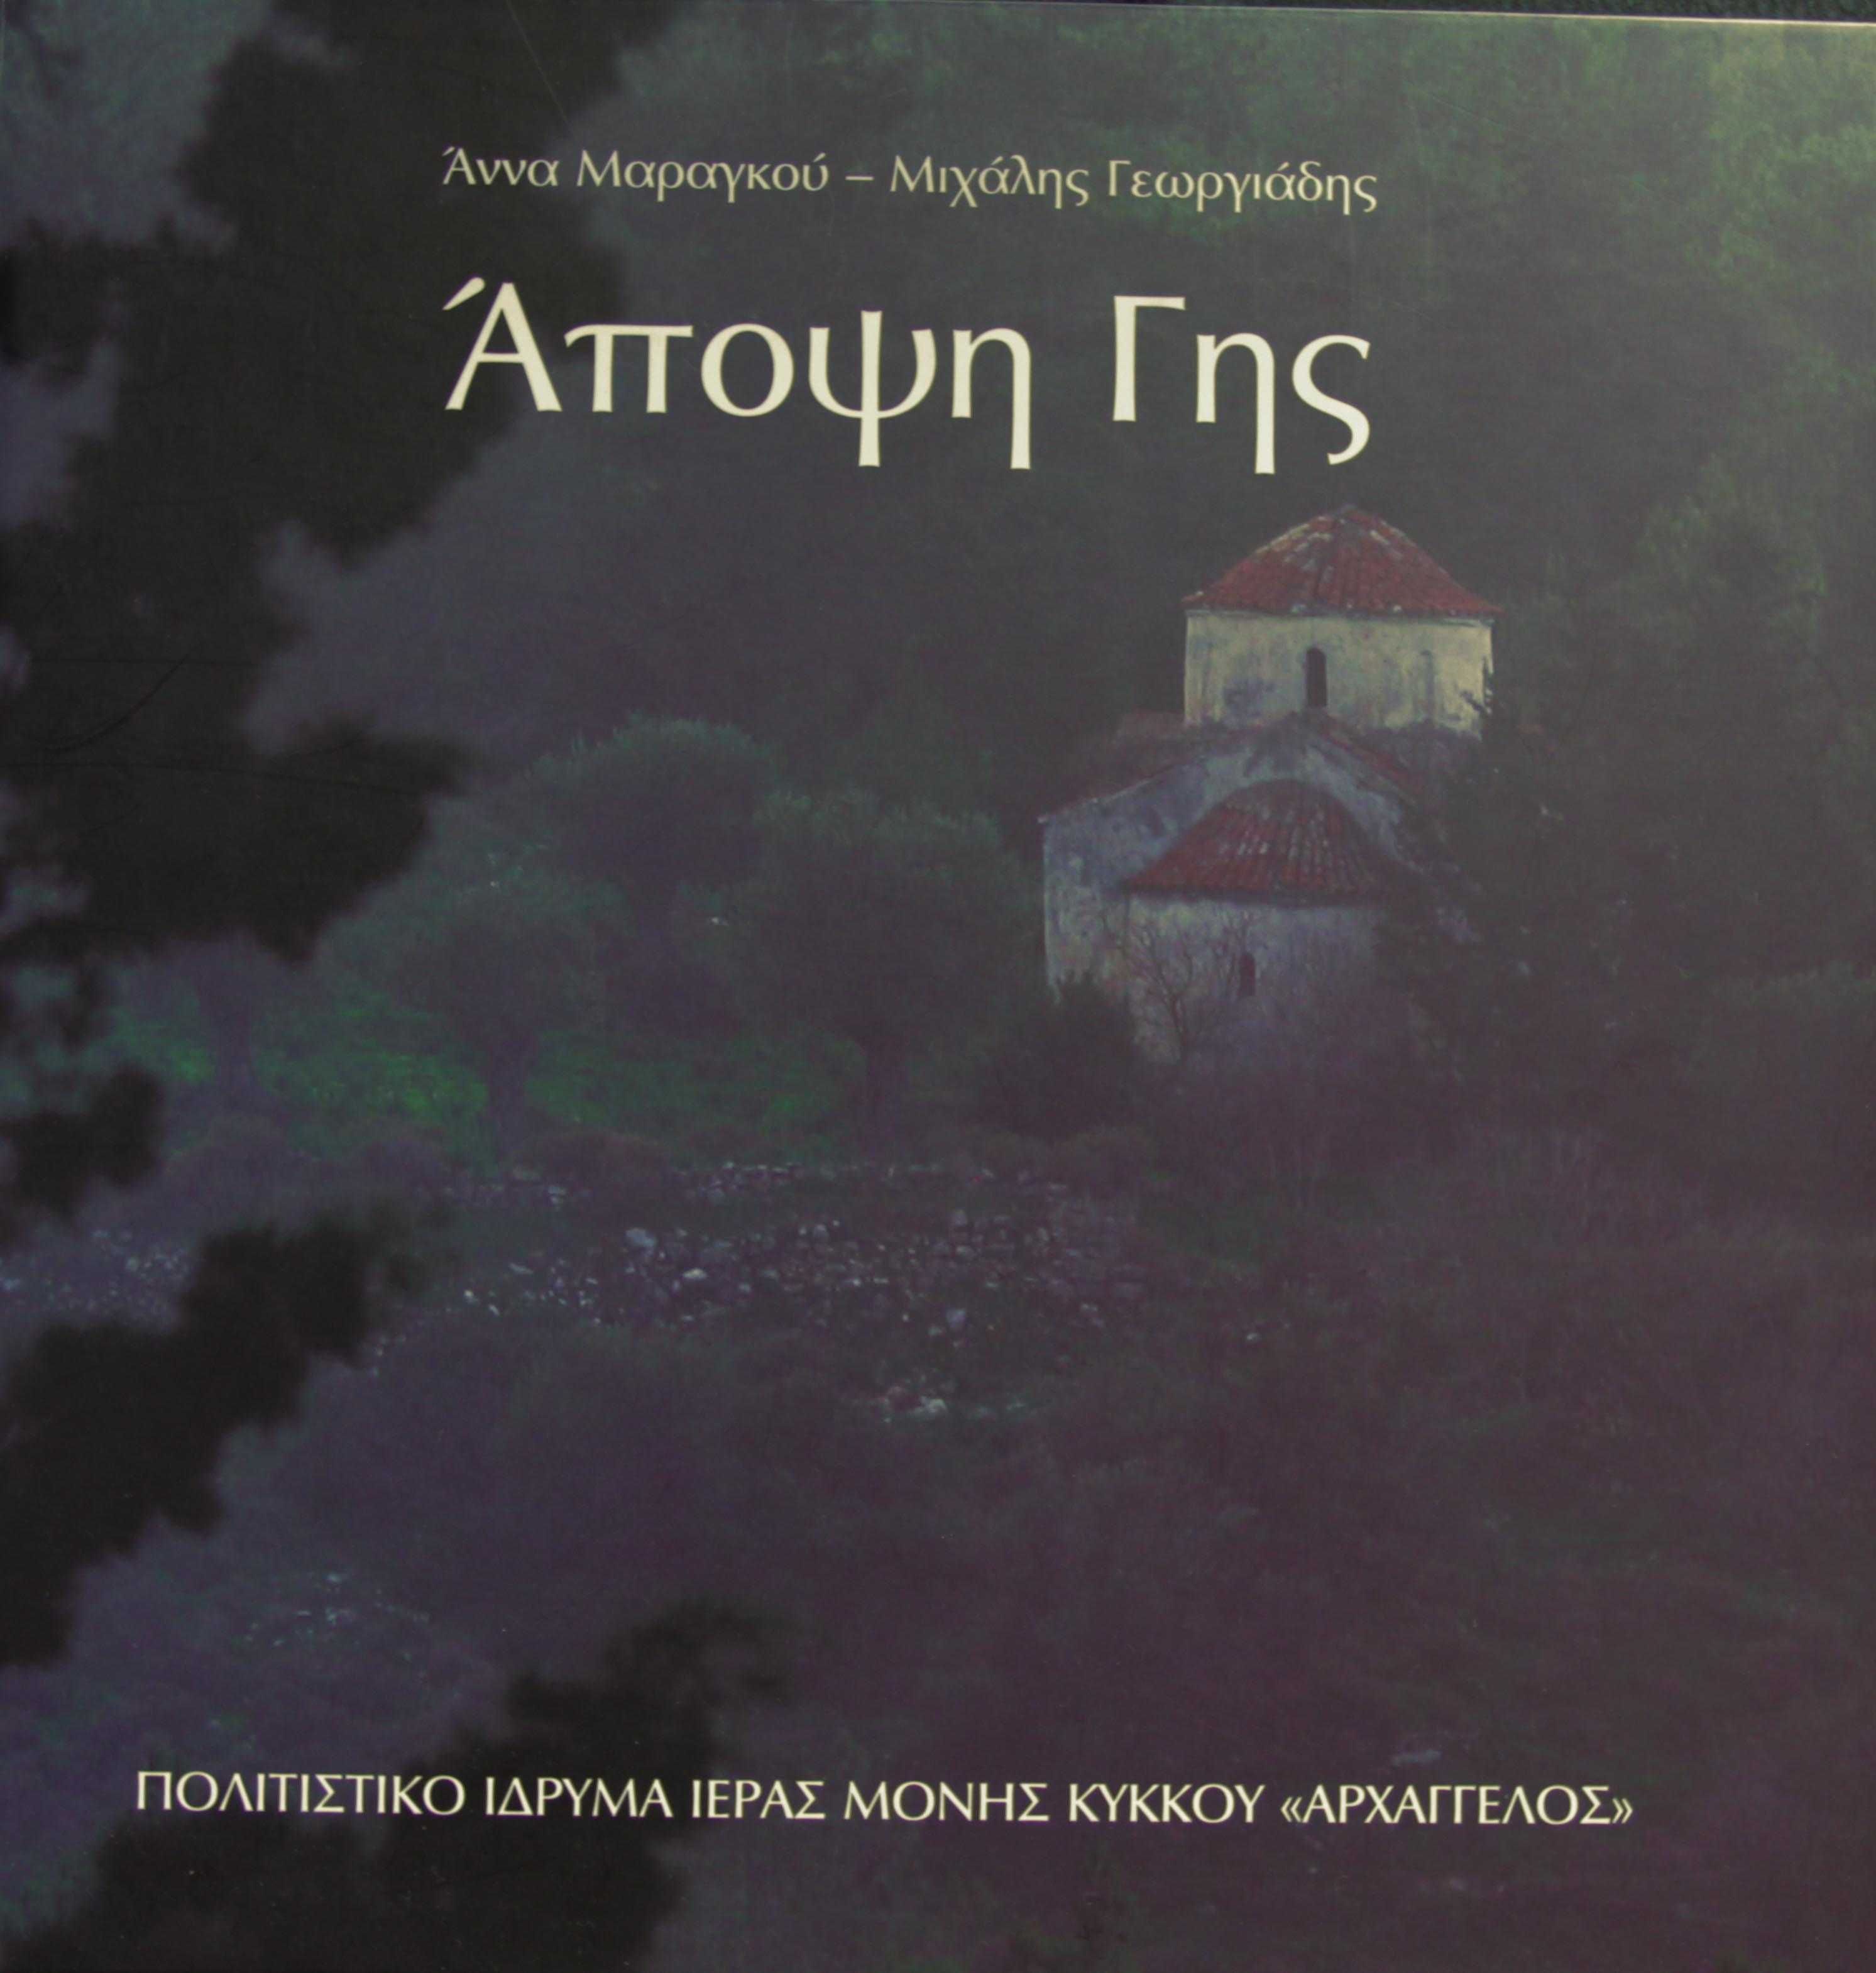 Apopsi gis book